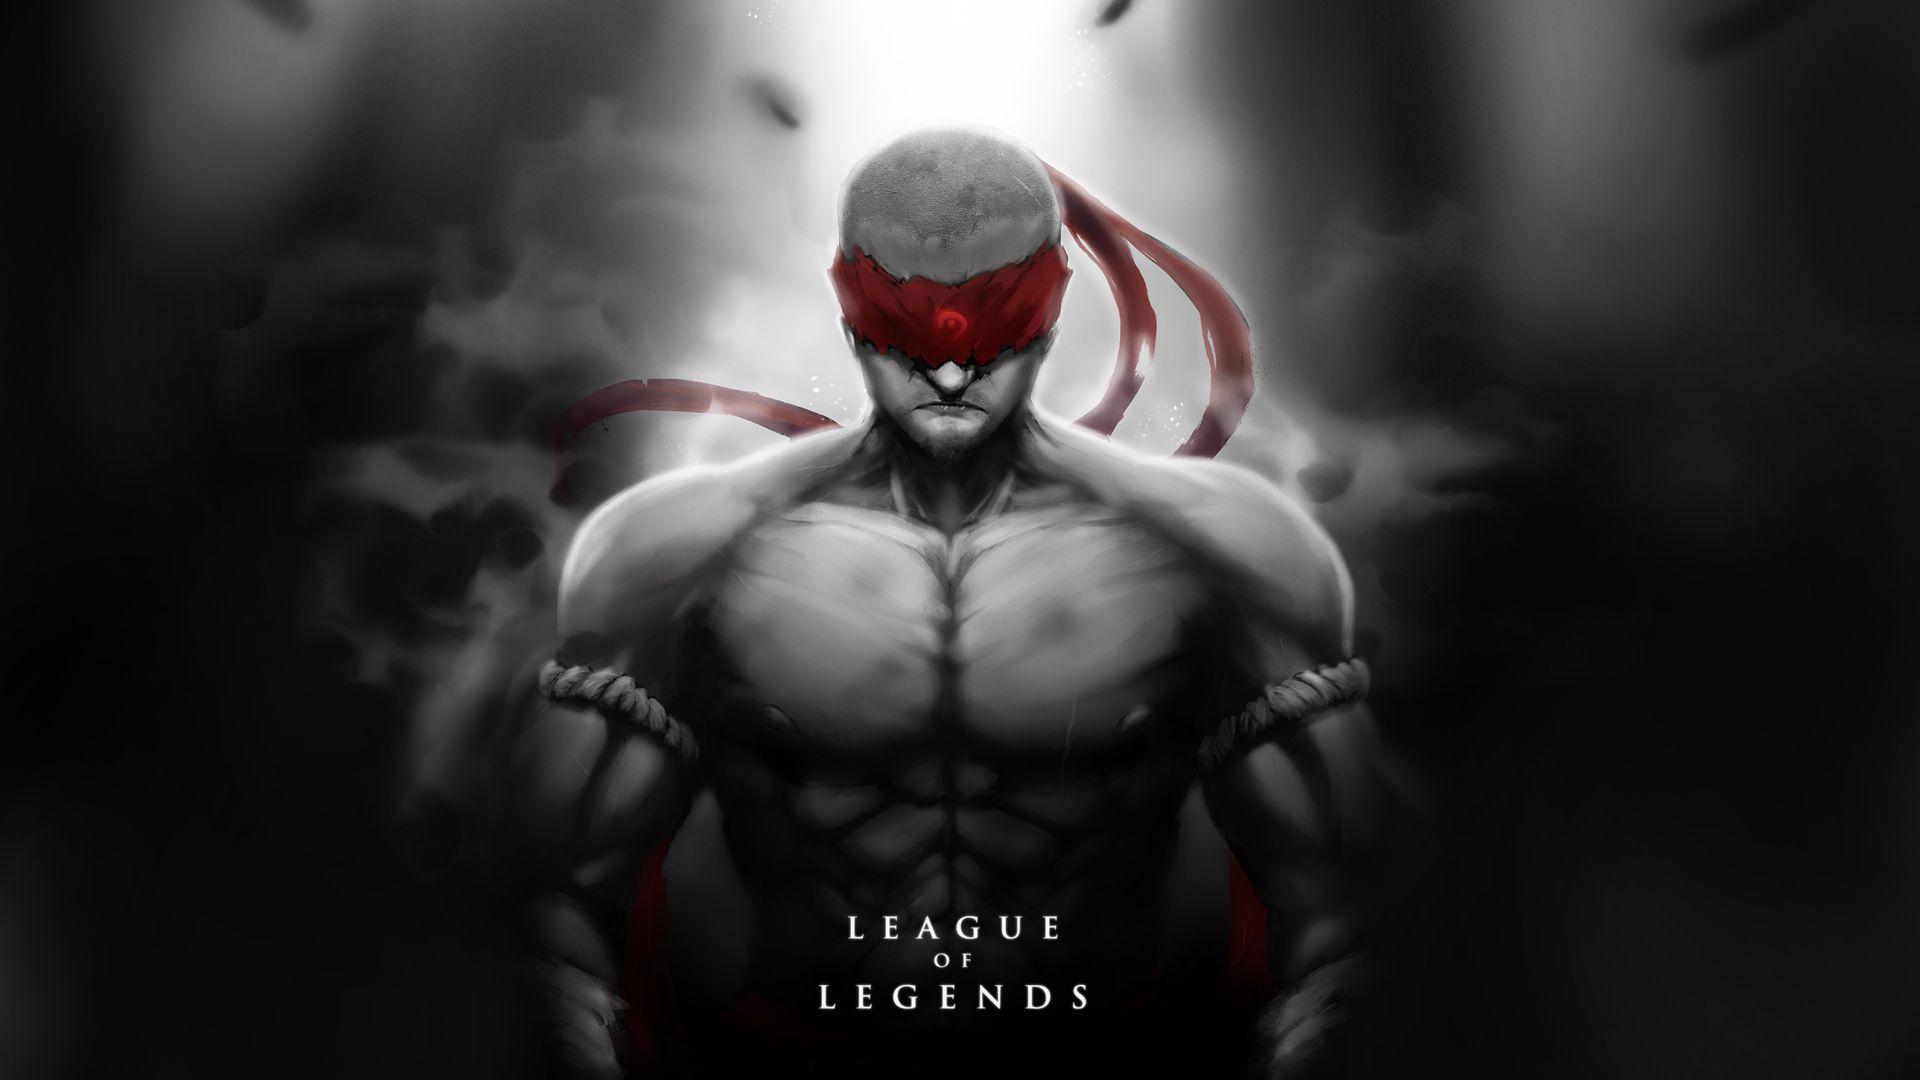 Lee Sin Walpaper Leagueoflegends Lol Champions League Of Legends League Of Legends Poster